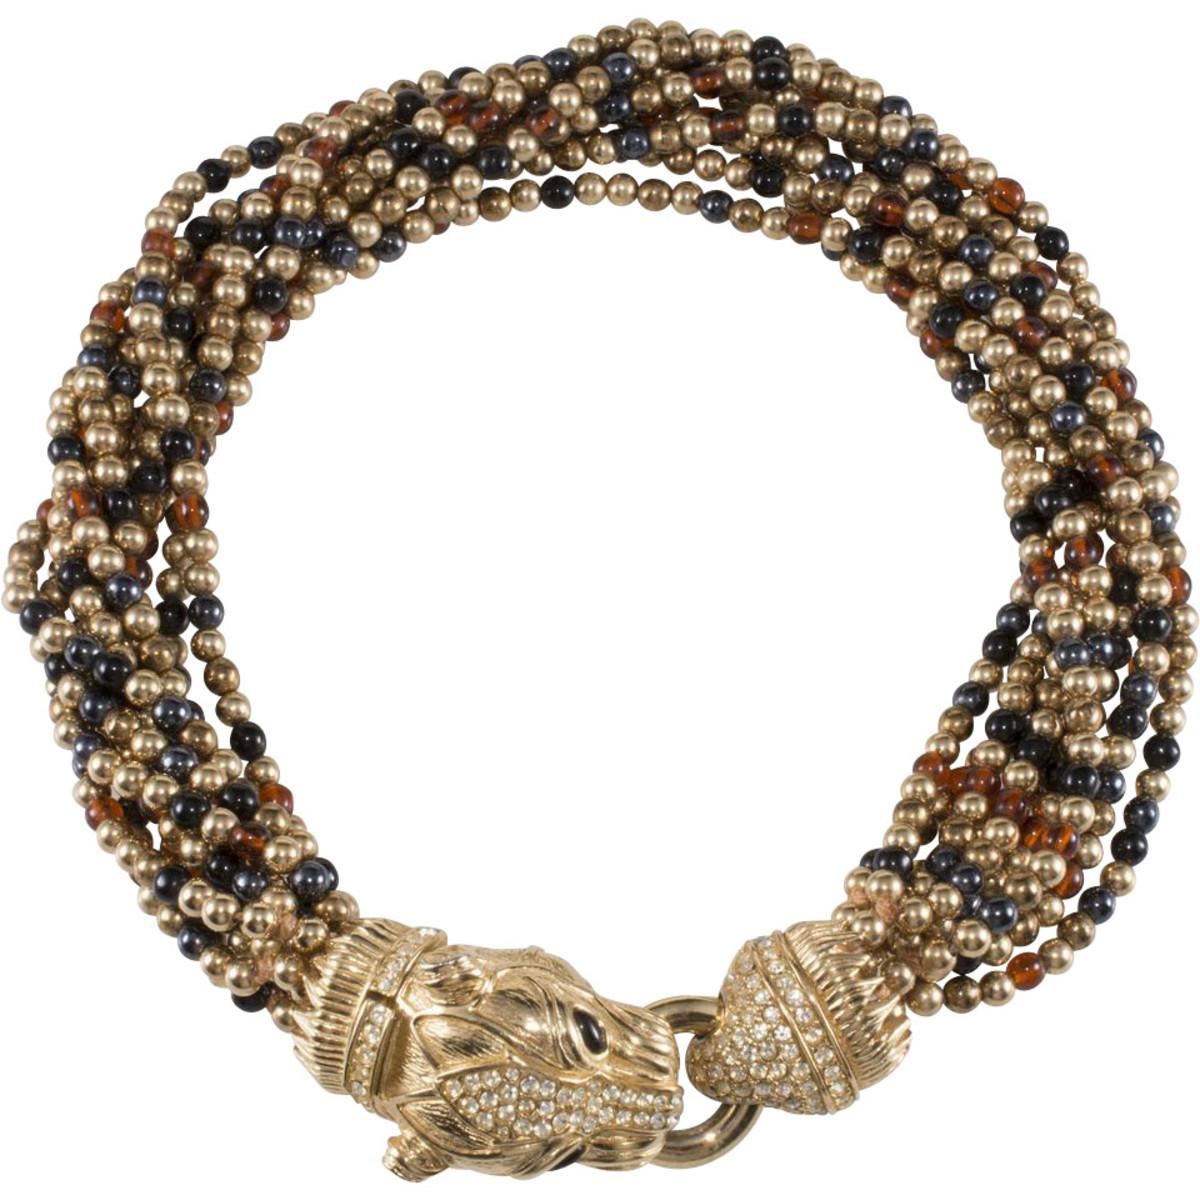 Ciner torsade necklace